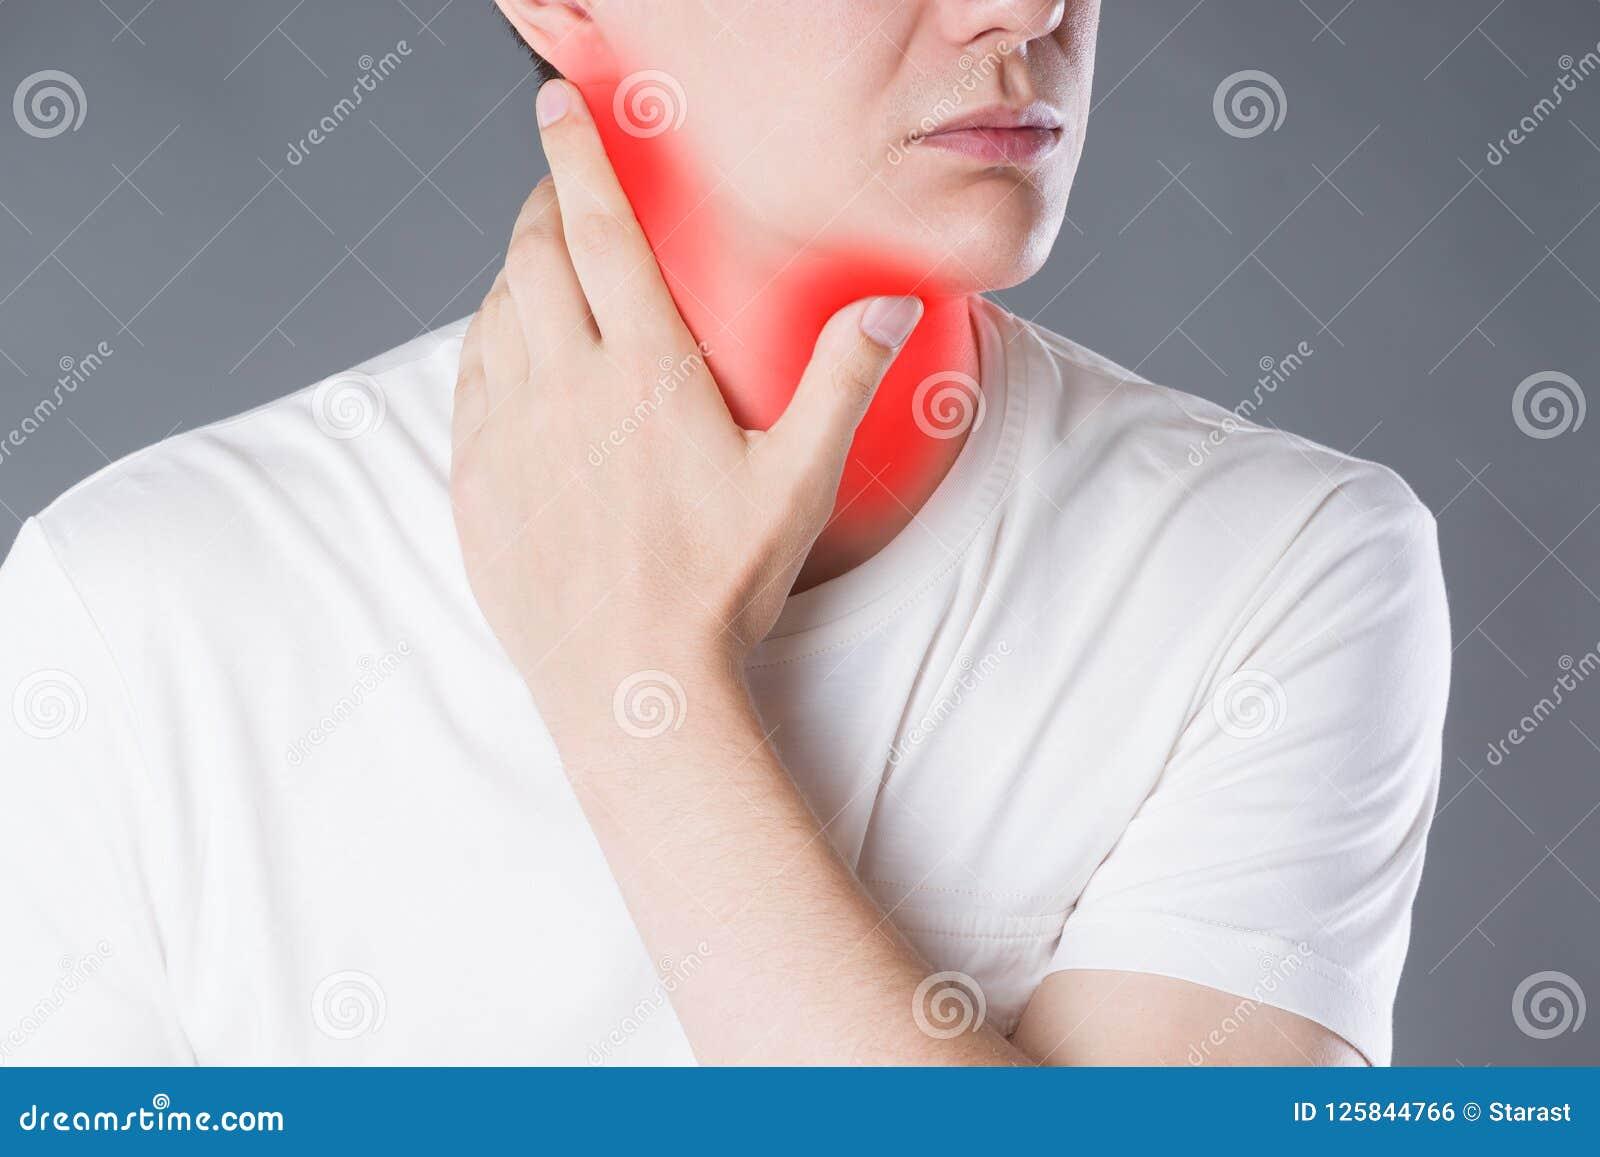 men in pain pics